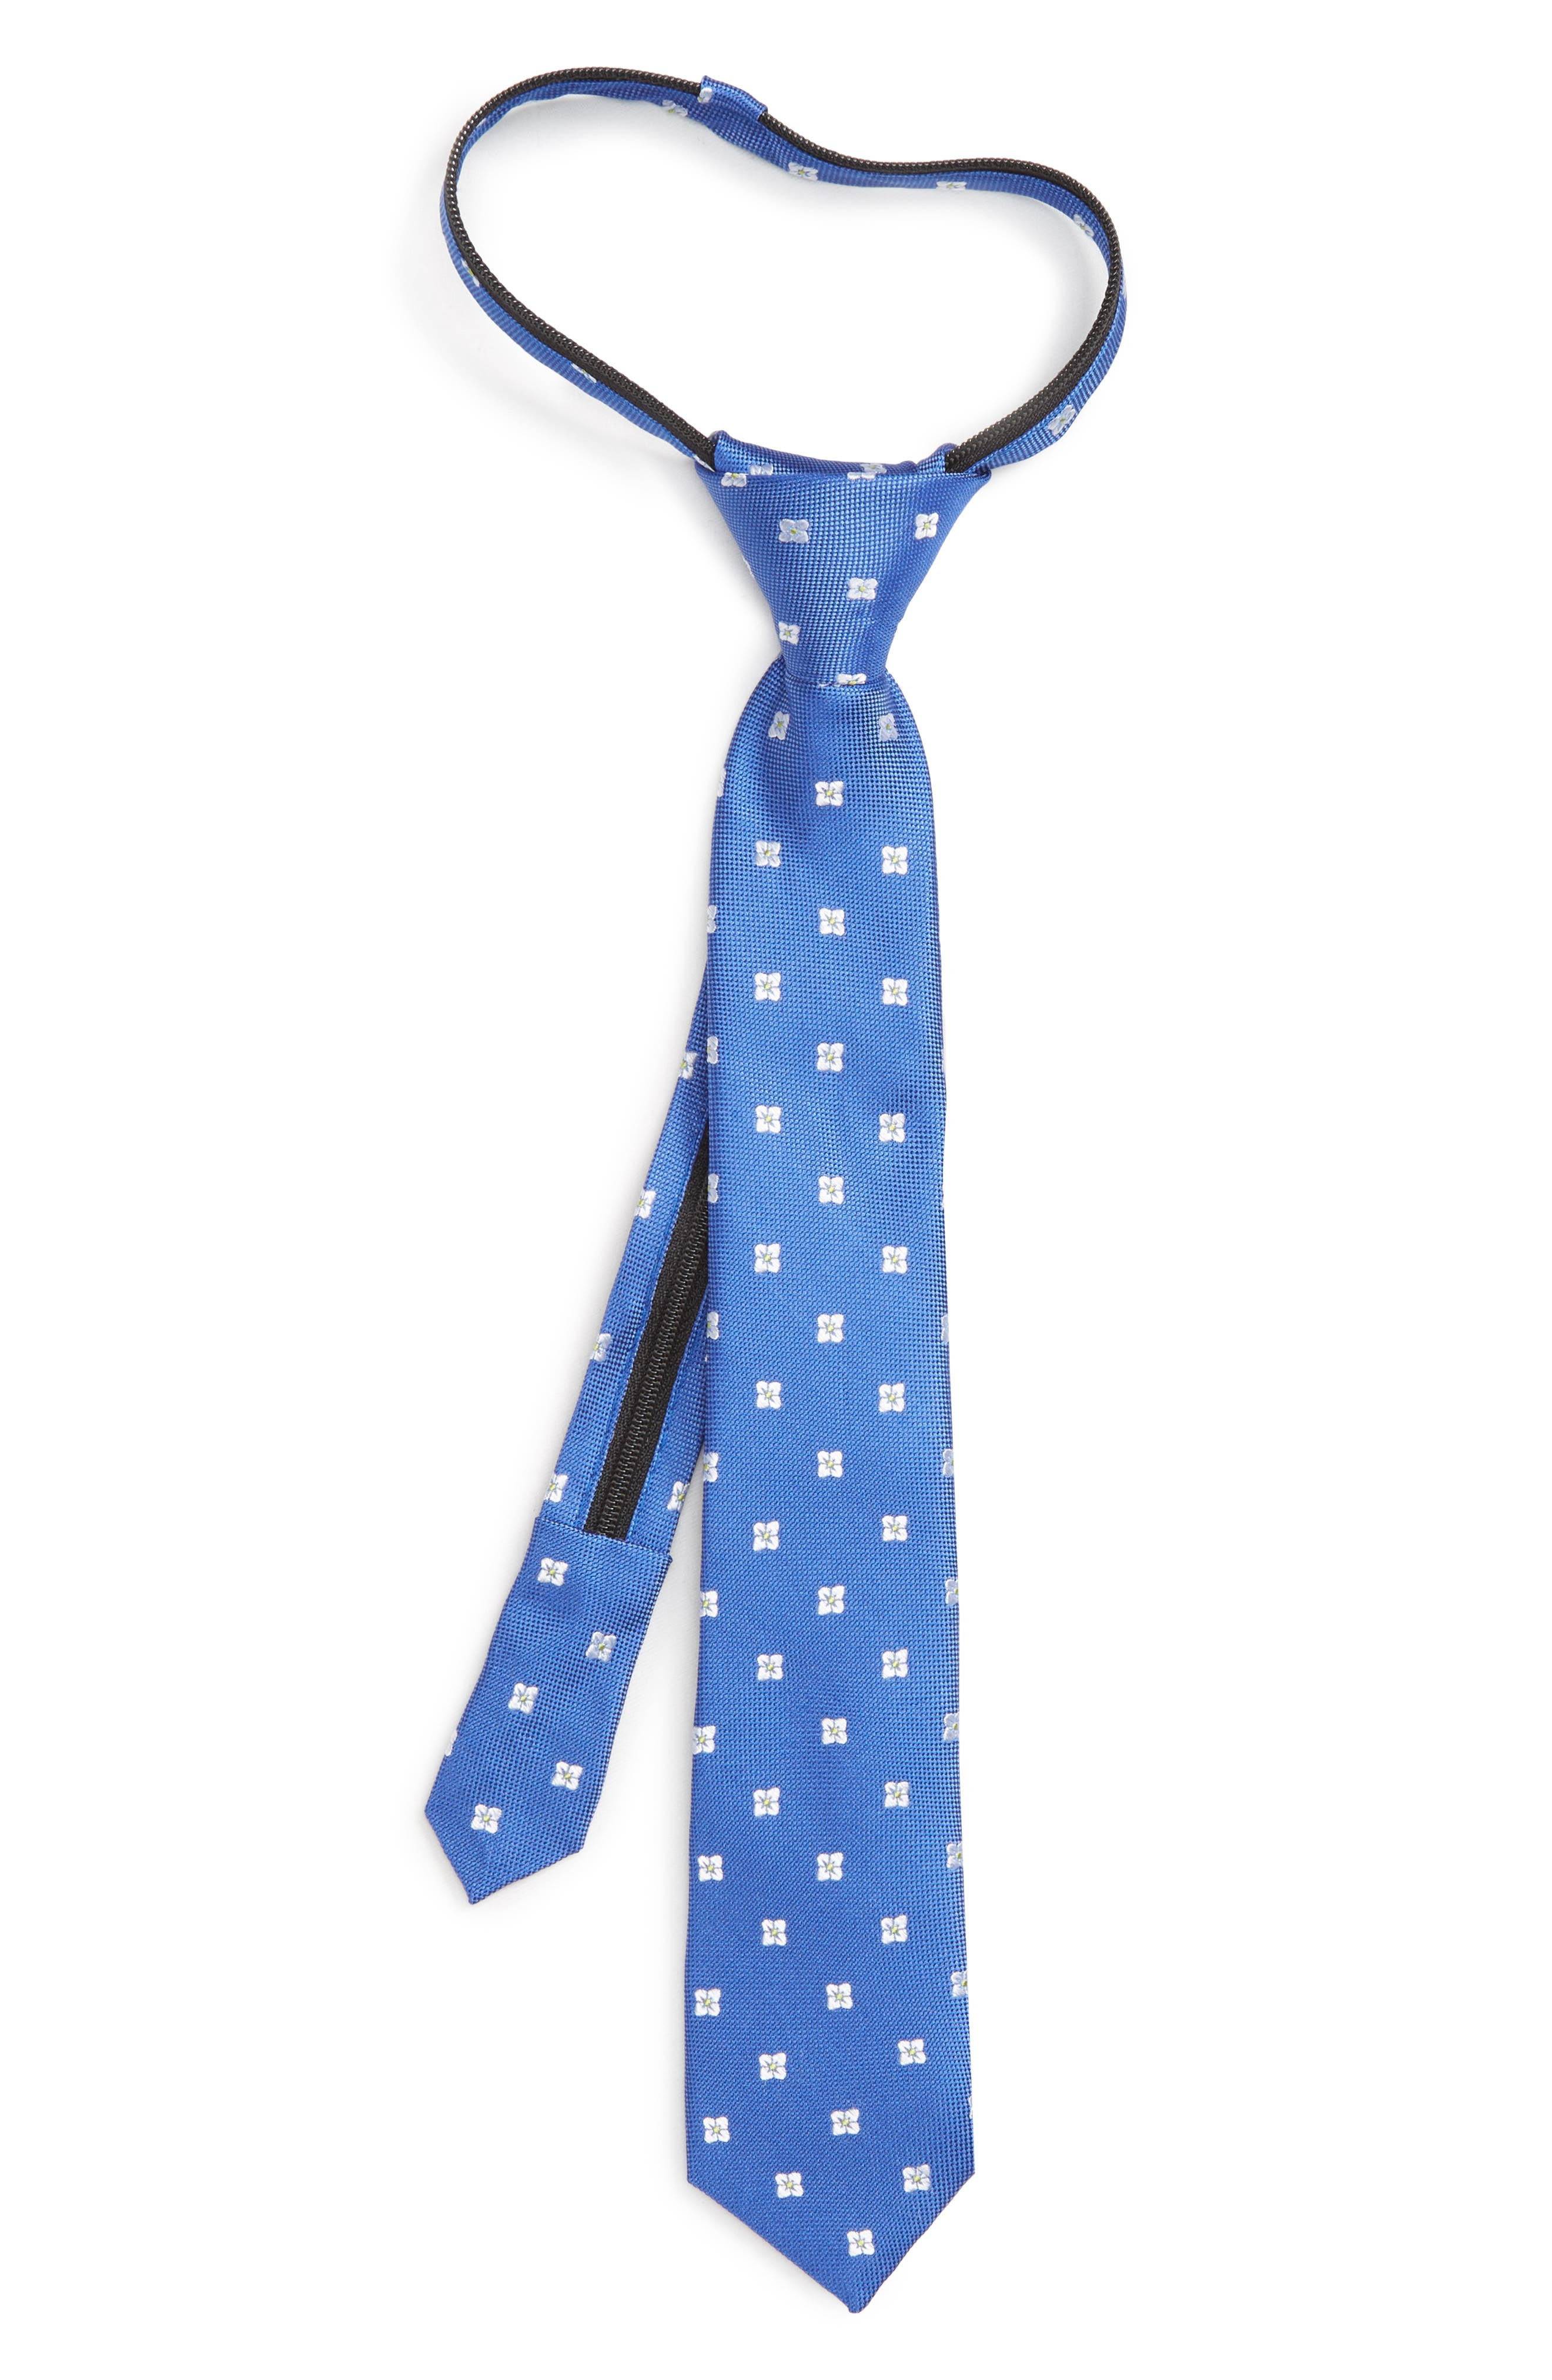 NORDSTROM,                             Floral Silk Zip Tie,                             Main thumbnail 1, color,                             431